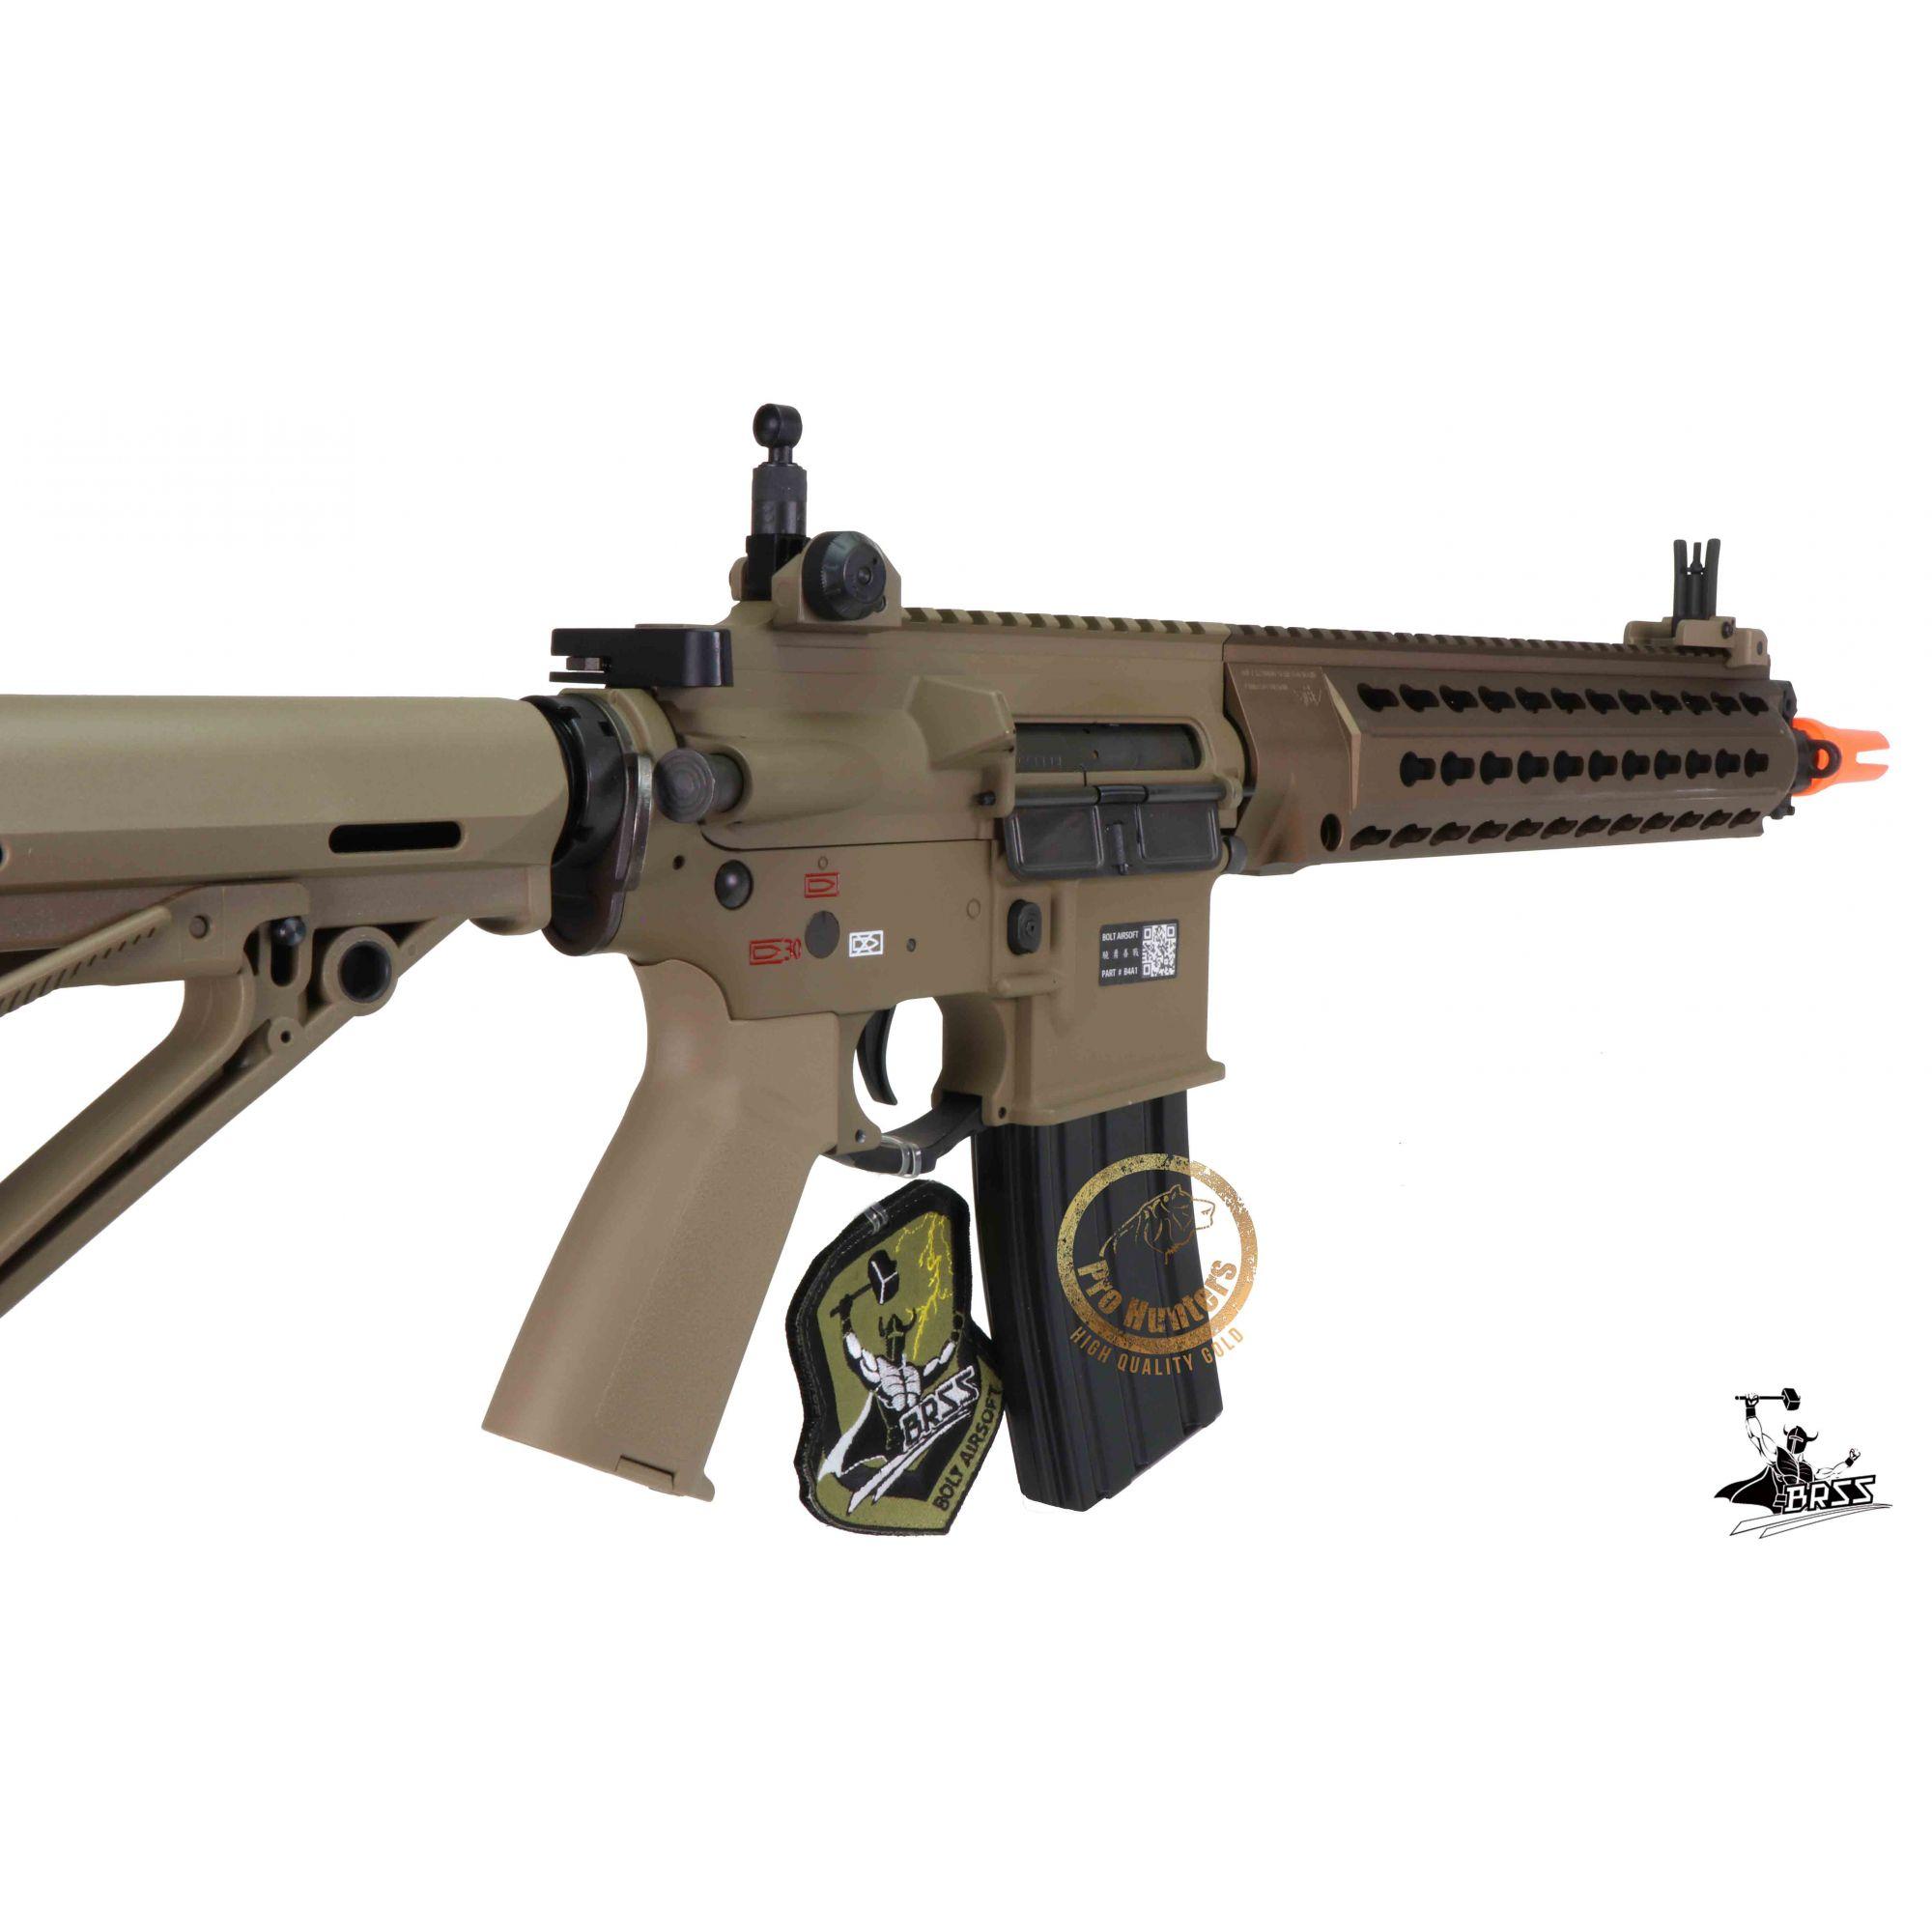 Rifle Airsoft M4 BOLT B4 DEVGRU K12 - Tan Full Metal - Blowback & Recoil System - FRETE GRÁTIS